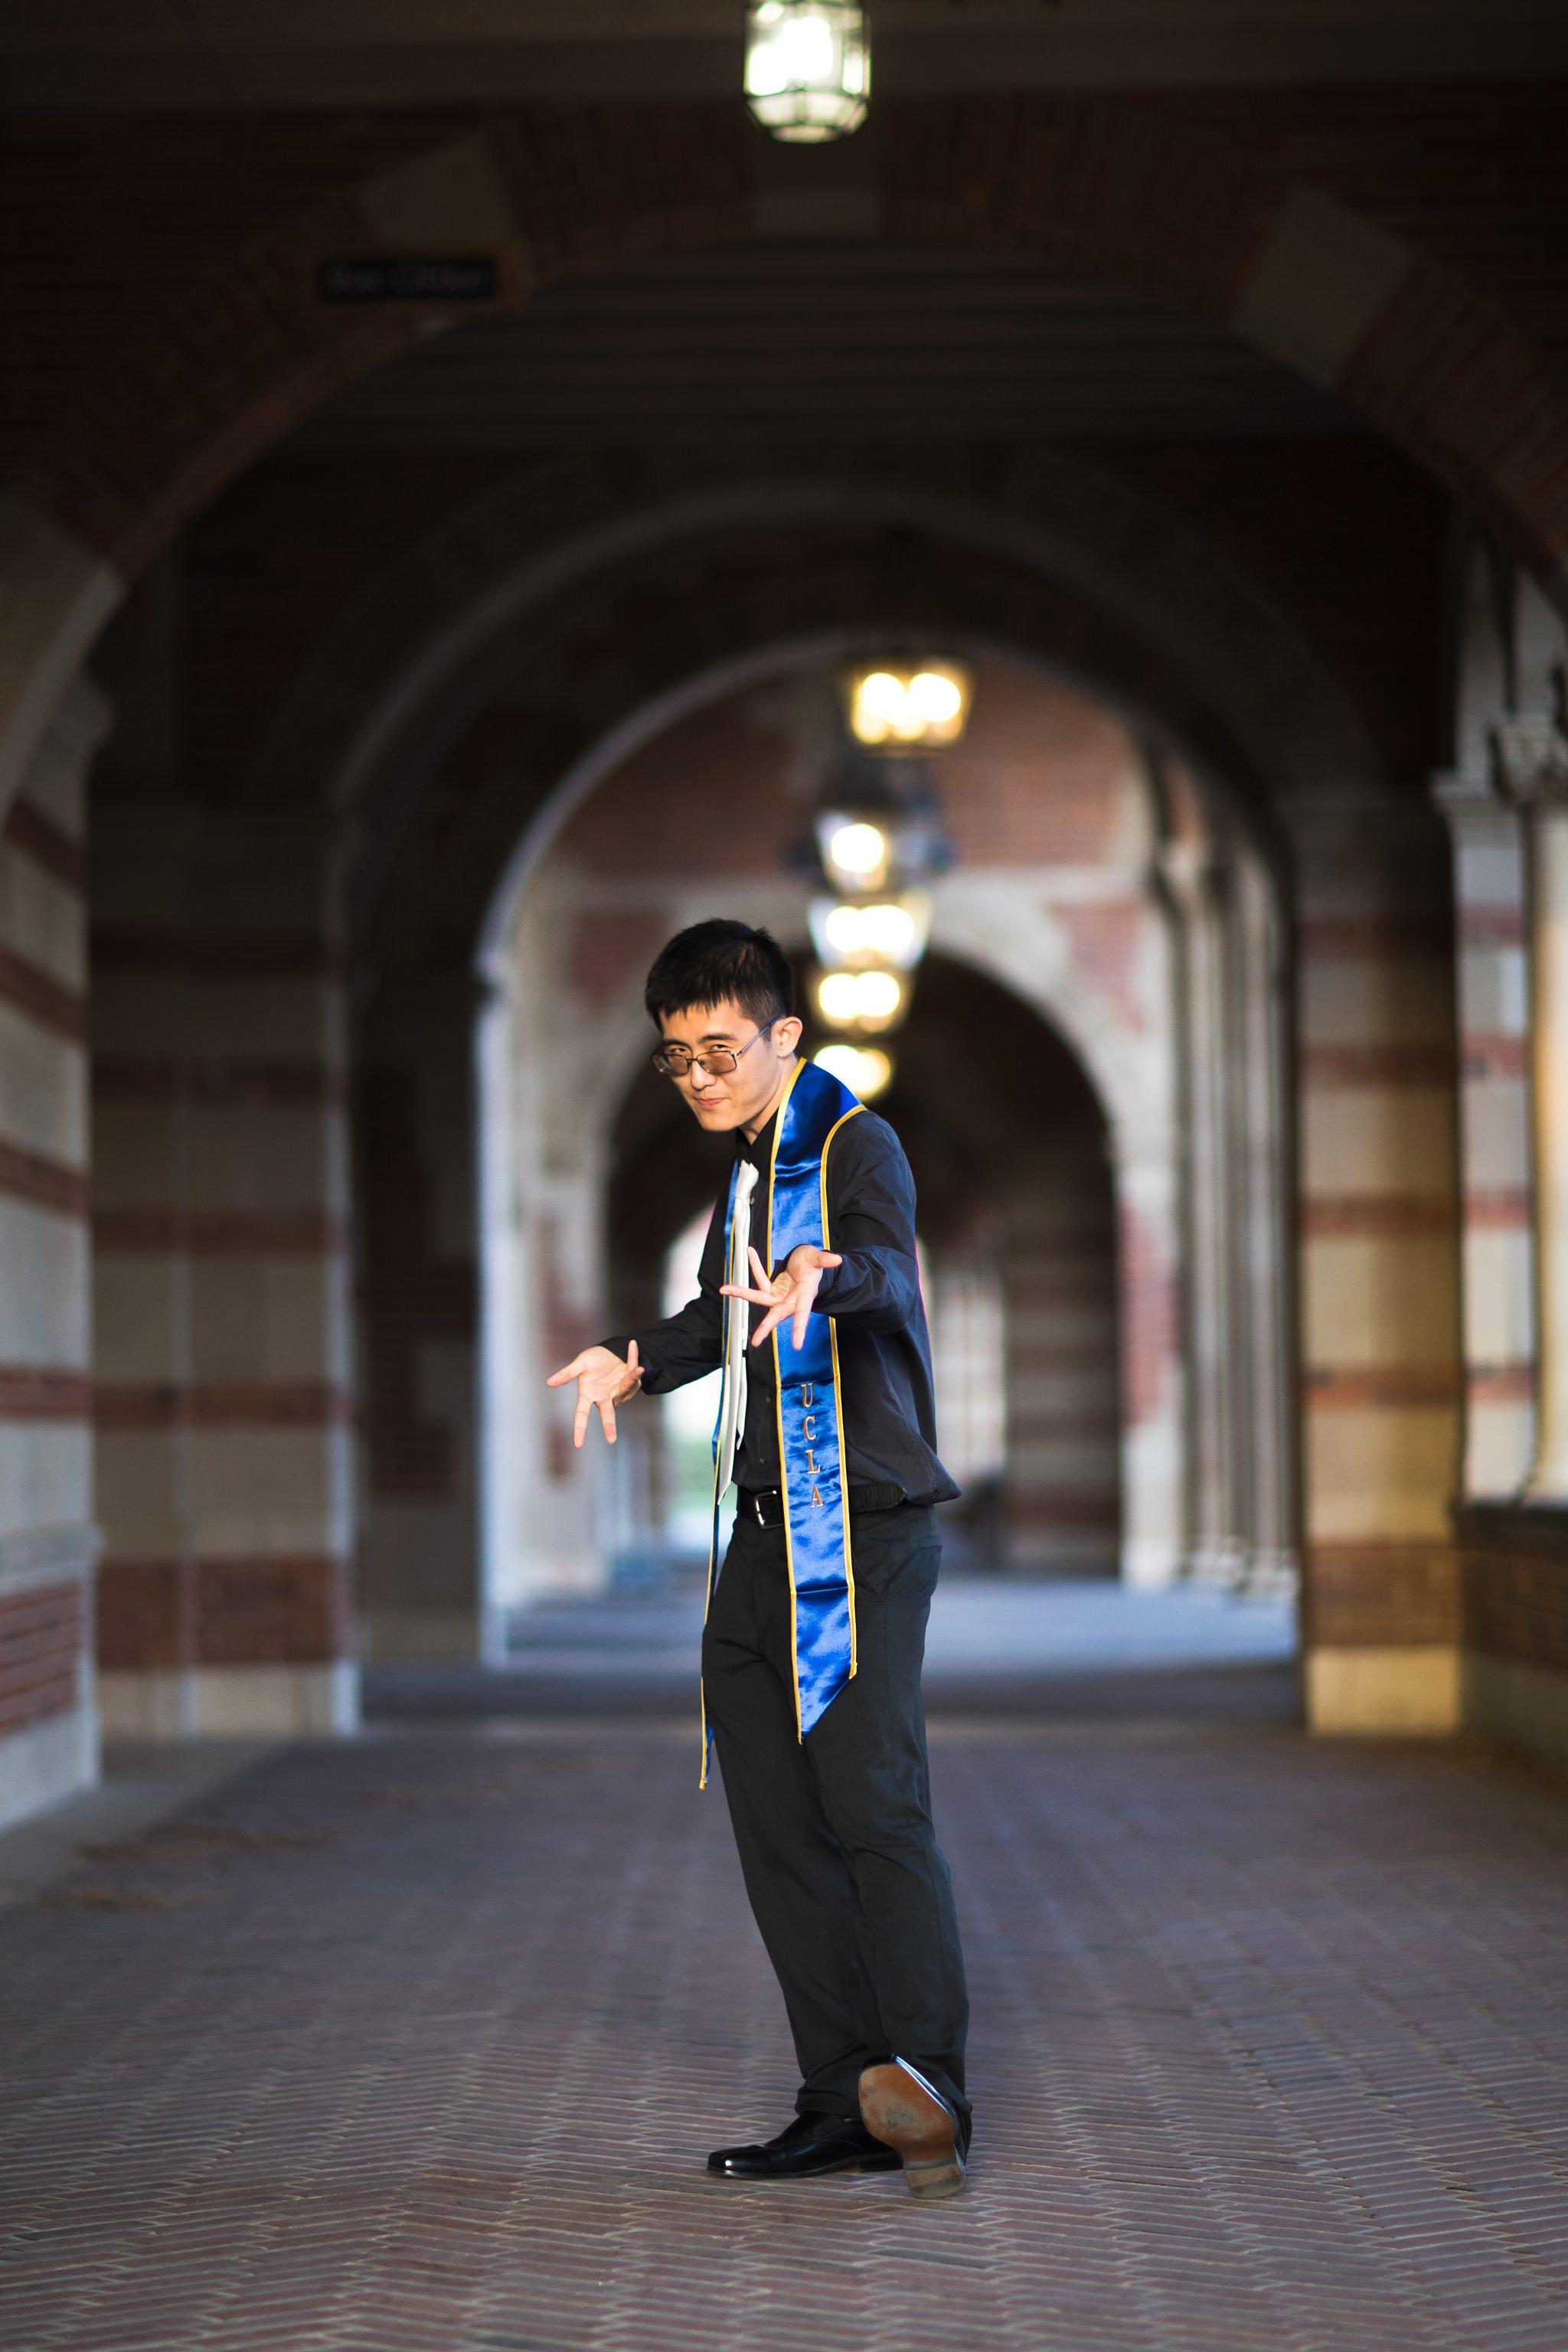 los-angeles-ucla-senior-graduation-portraits-royce-hall-arches